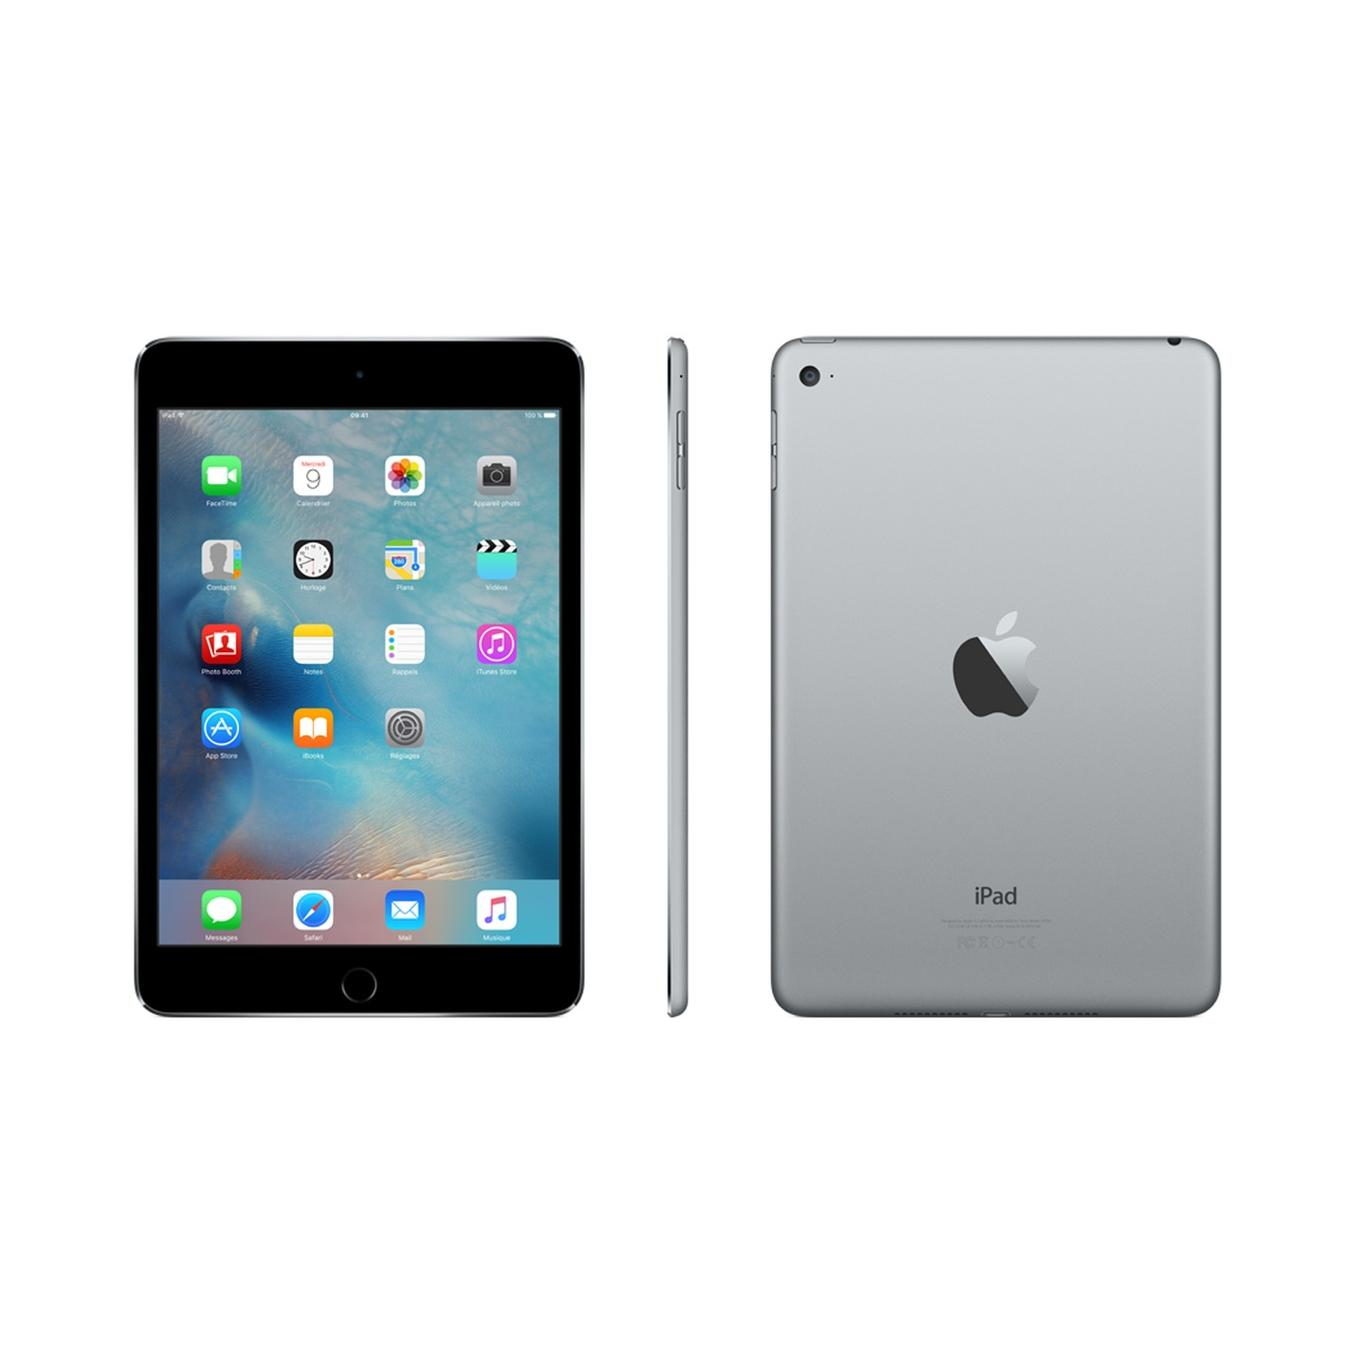 iPad mini 4 64 Go - 4G - Gris sidéral - Débloqué